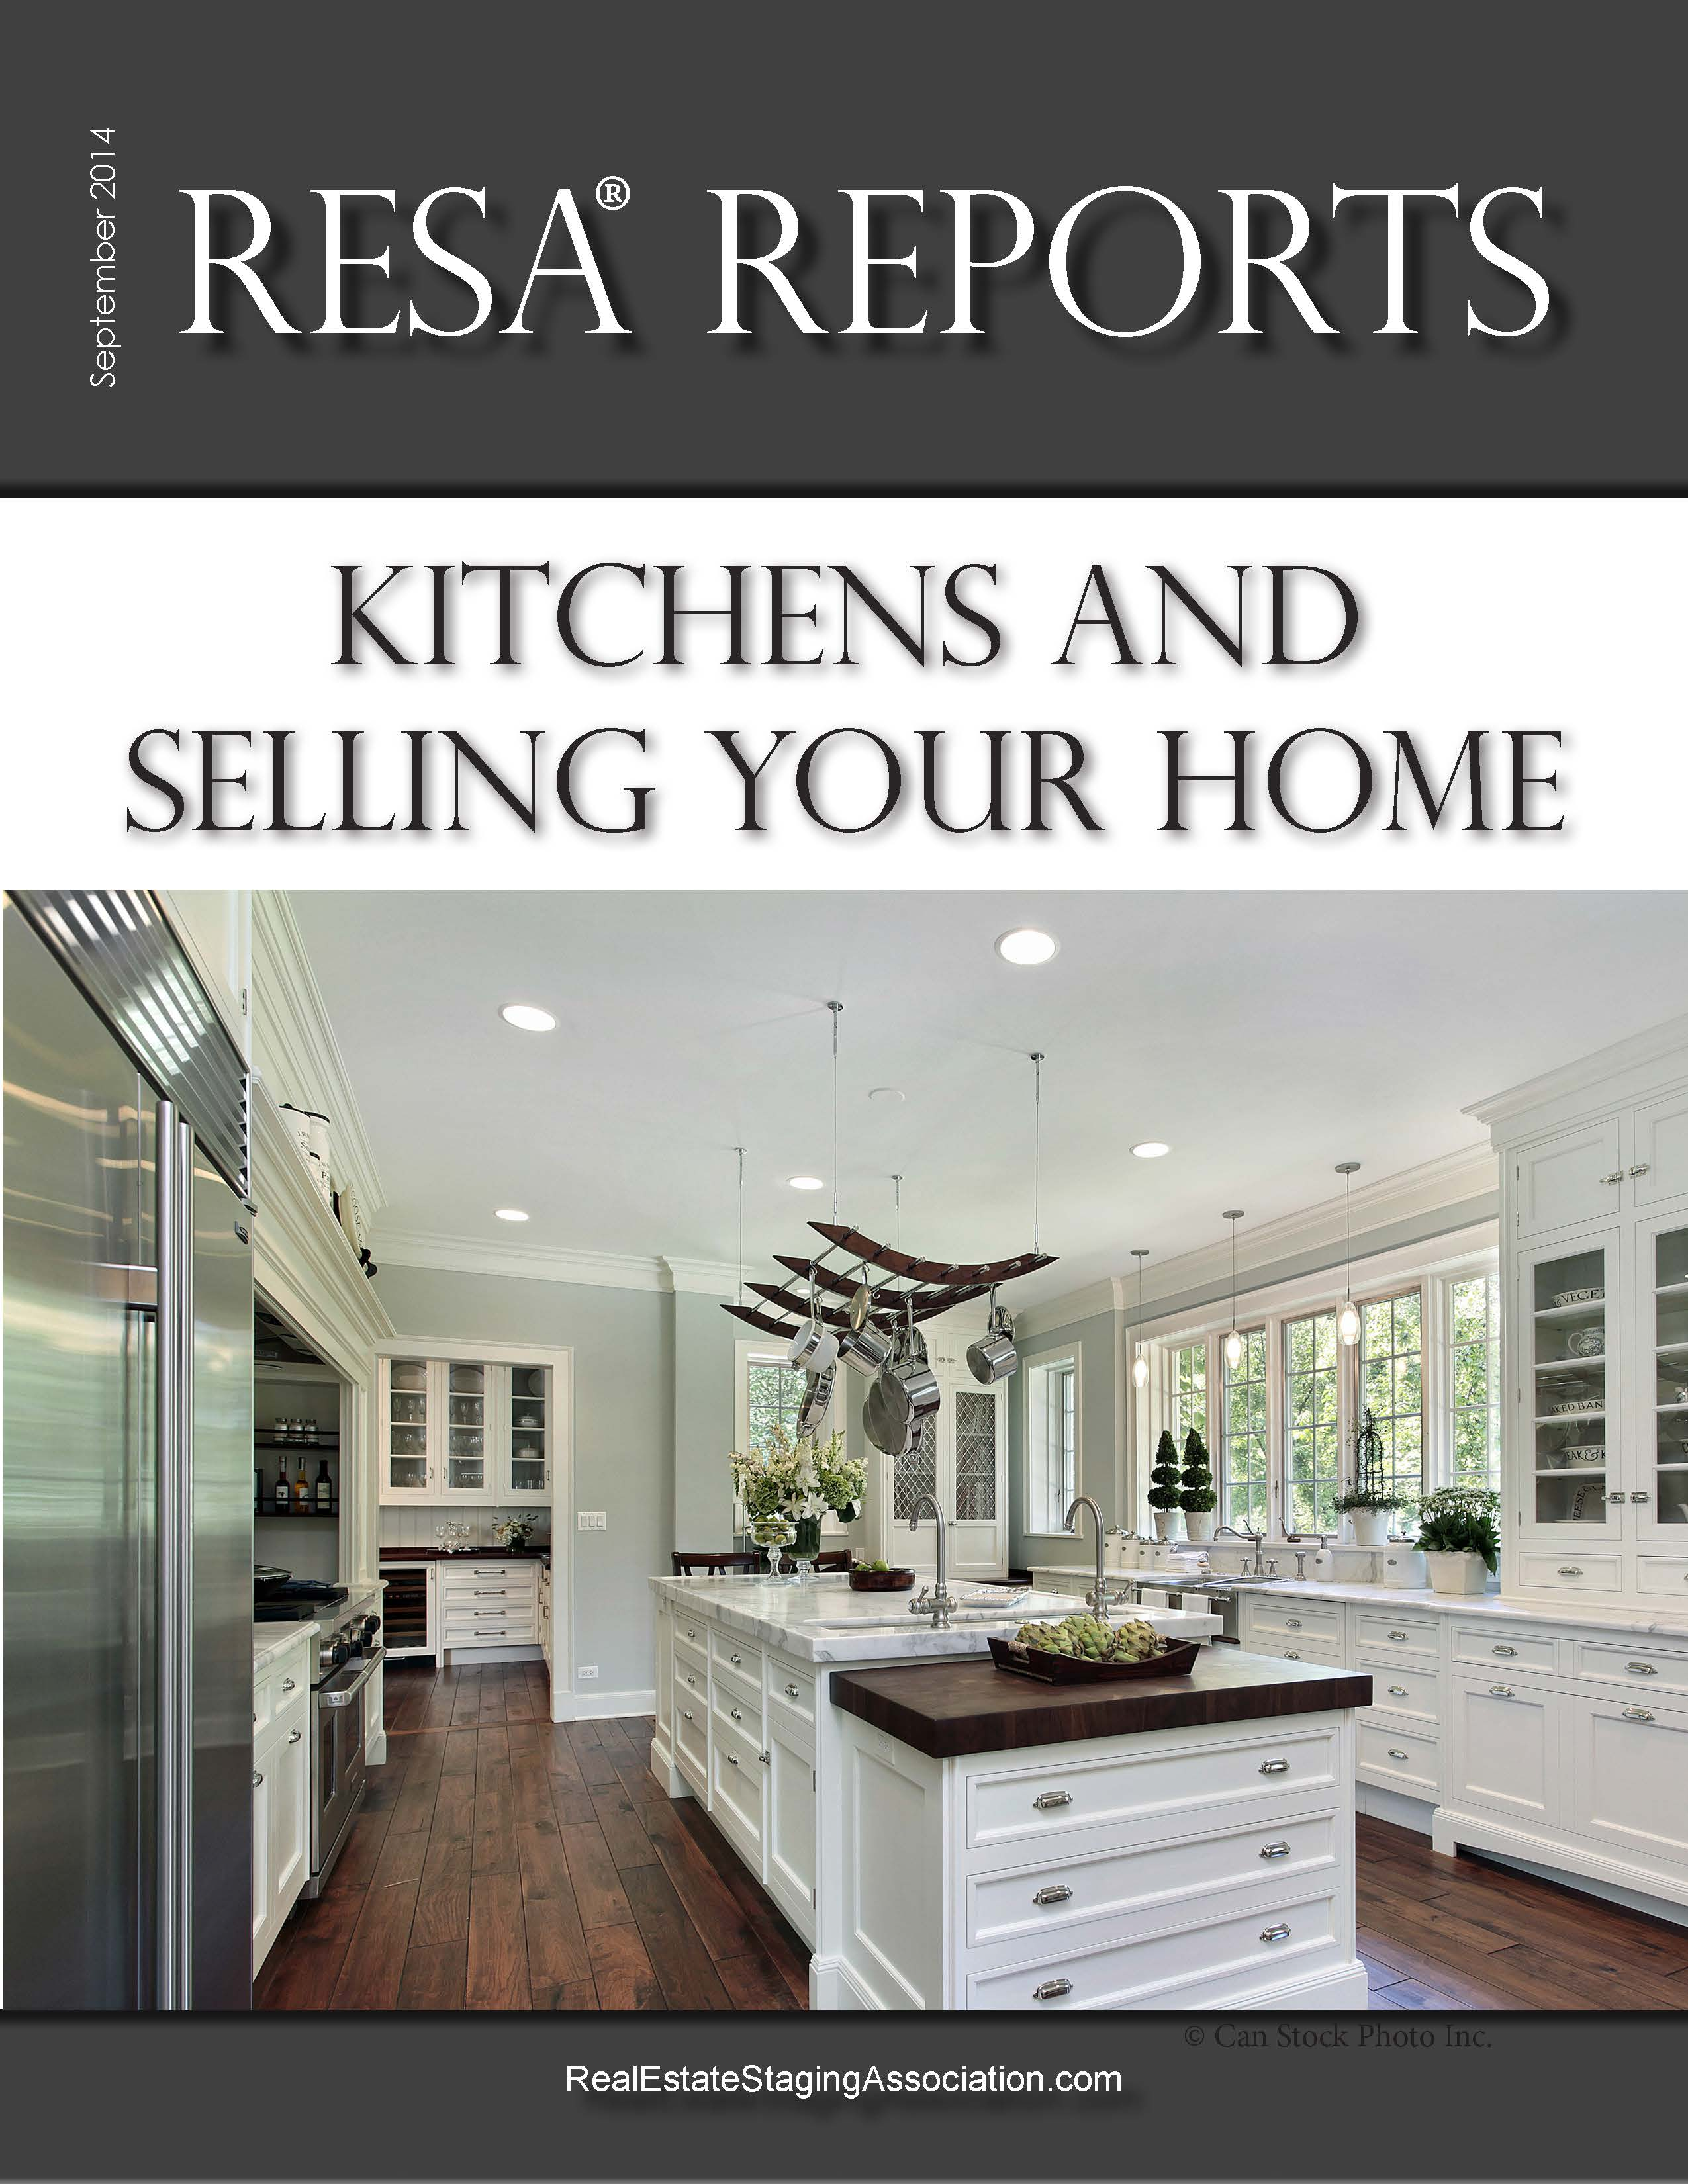 Real Estate Staging Association Report Kitchens